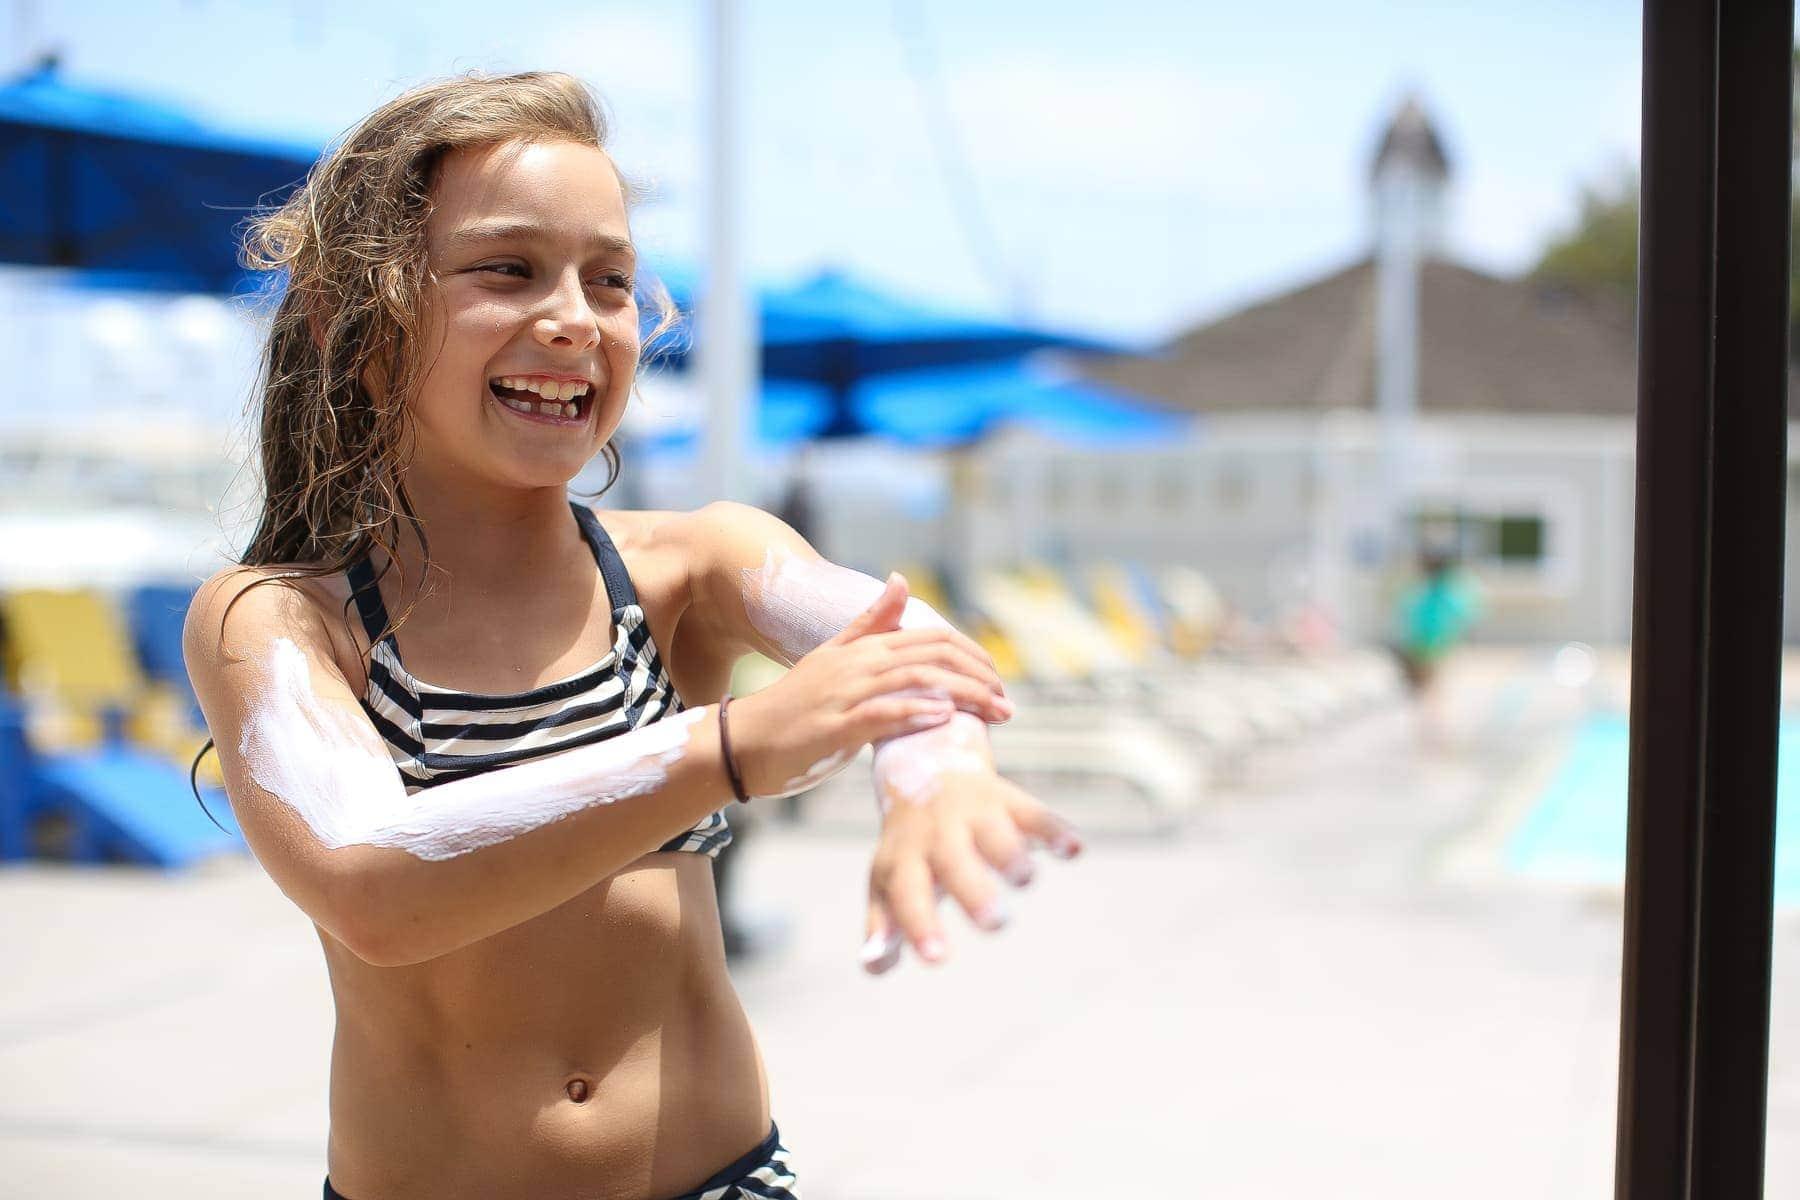 girl putting on sunblock